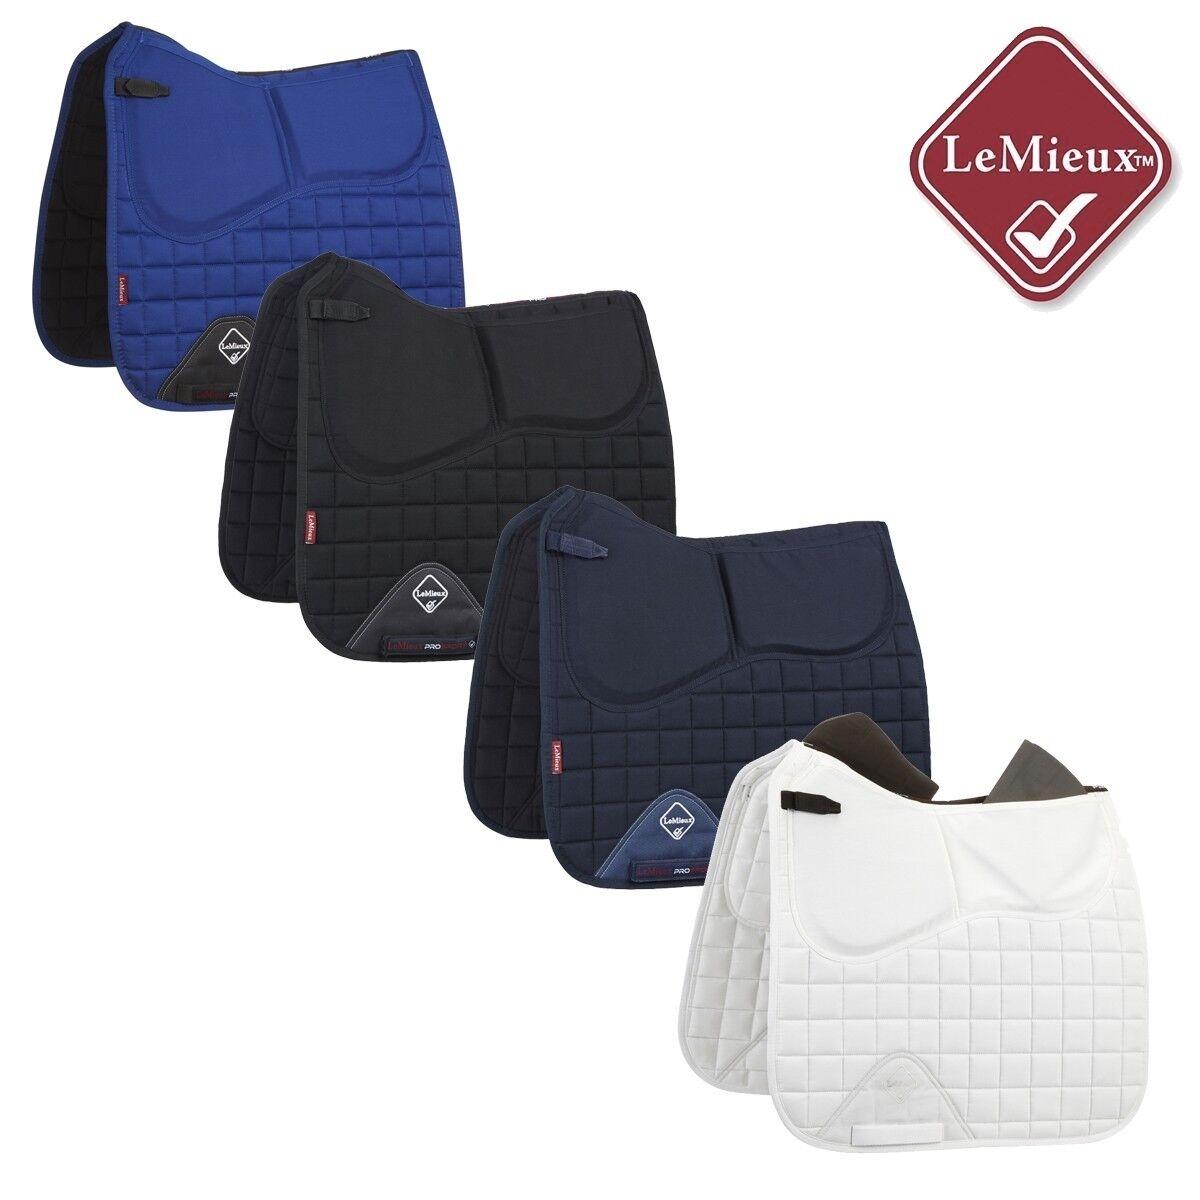 %TOP-ANGEBOT  LeMieux Pro-Sorb Plain Dressur Korrektur Schabracke 4 Farben Farben Farben -NH 8c6957